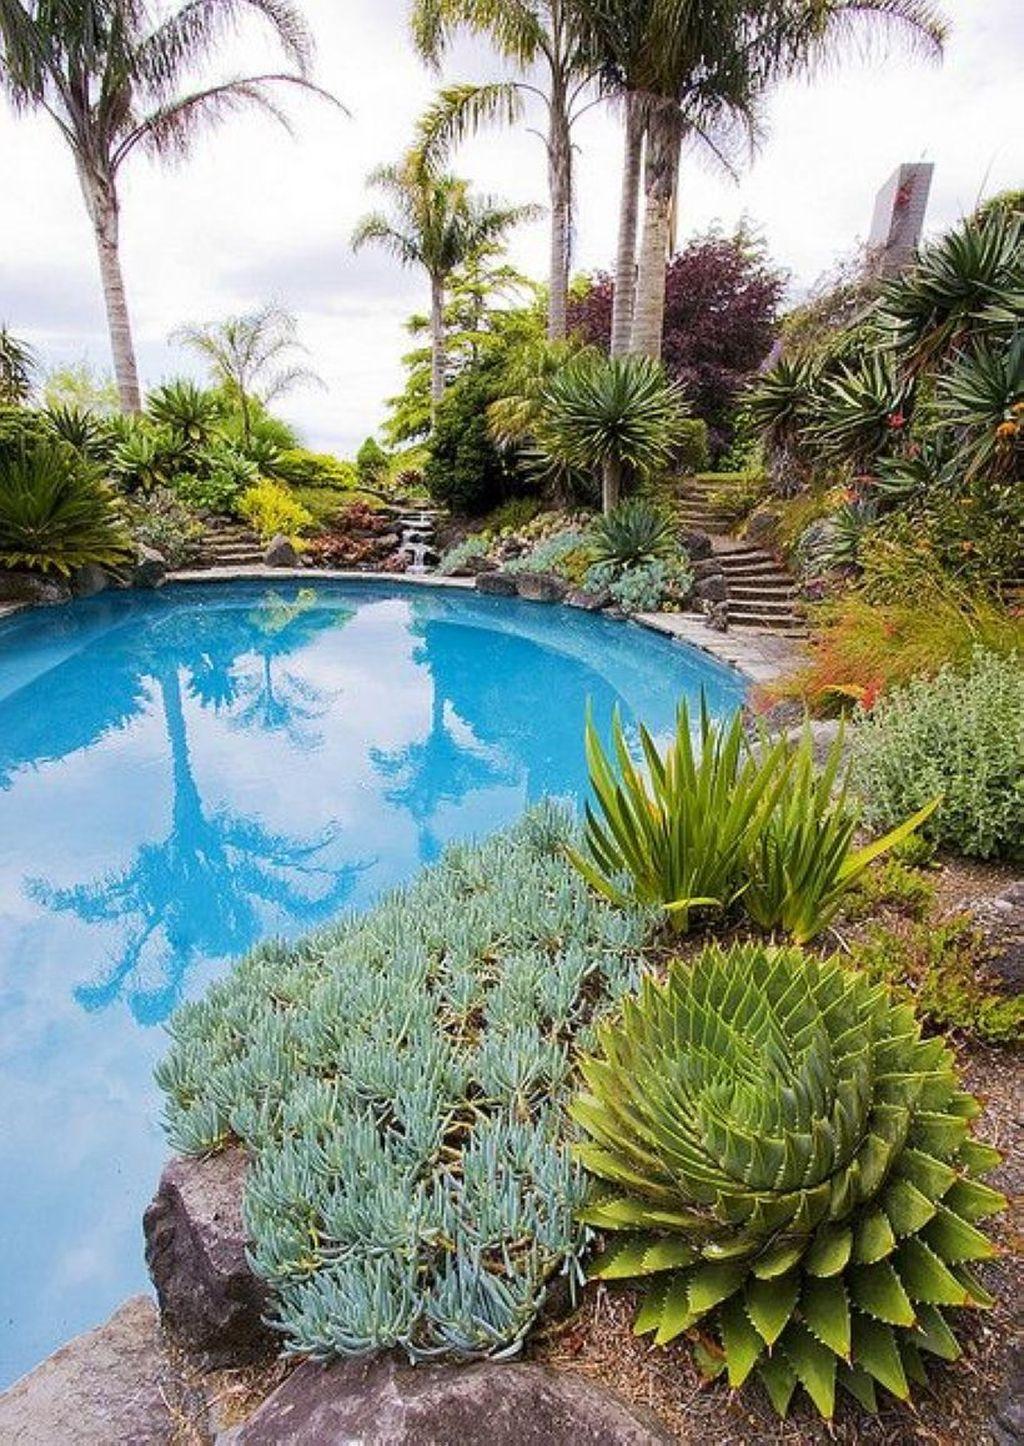 Incredible Cactus Garden Landscaping Ideas Best For Summer 11